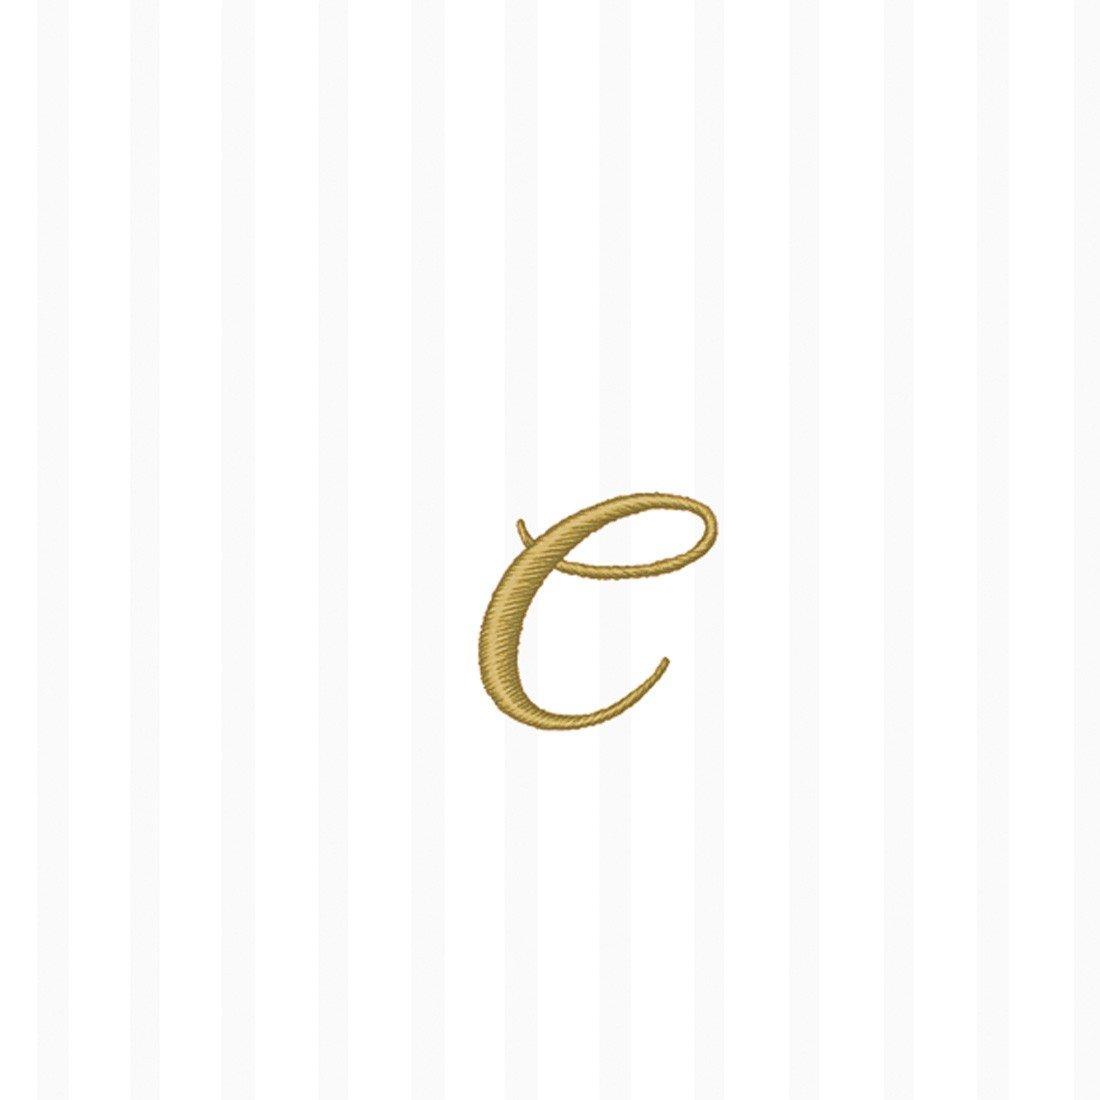 Ideal Home Range 20-Count 3-Ply Paper Stripes Again Monogram Cocktail Napkins, C, Ivory Stripe